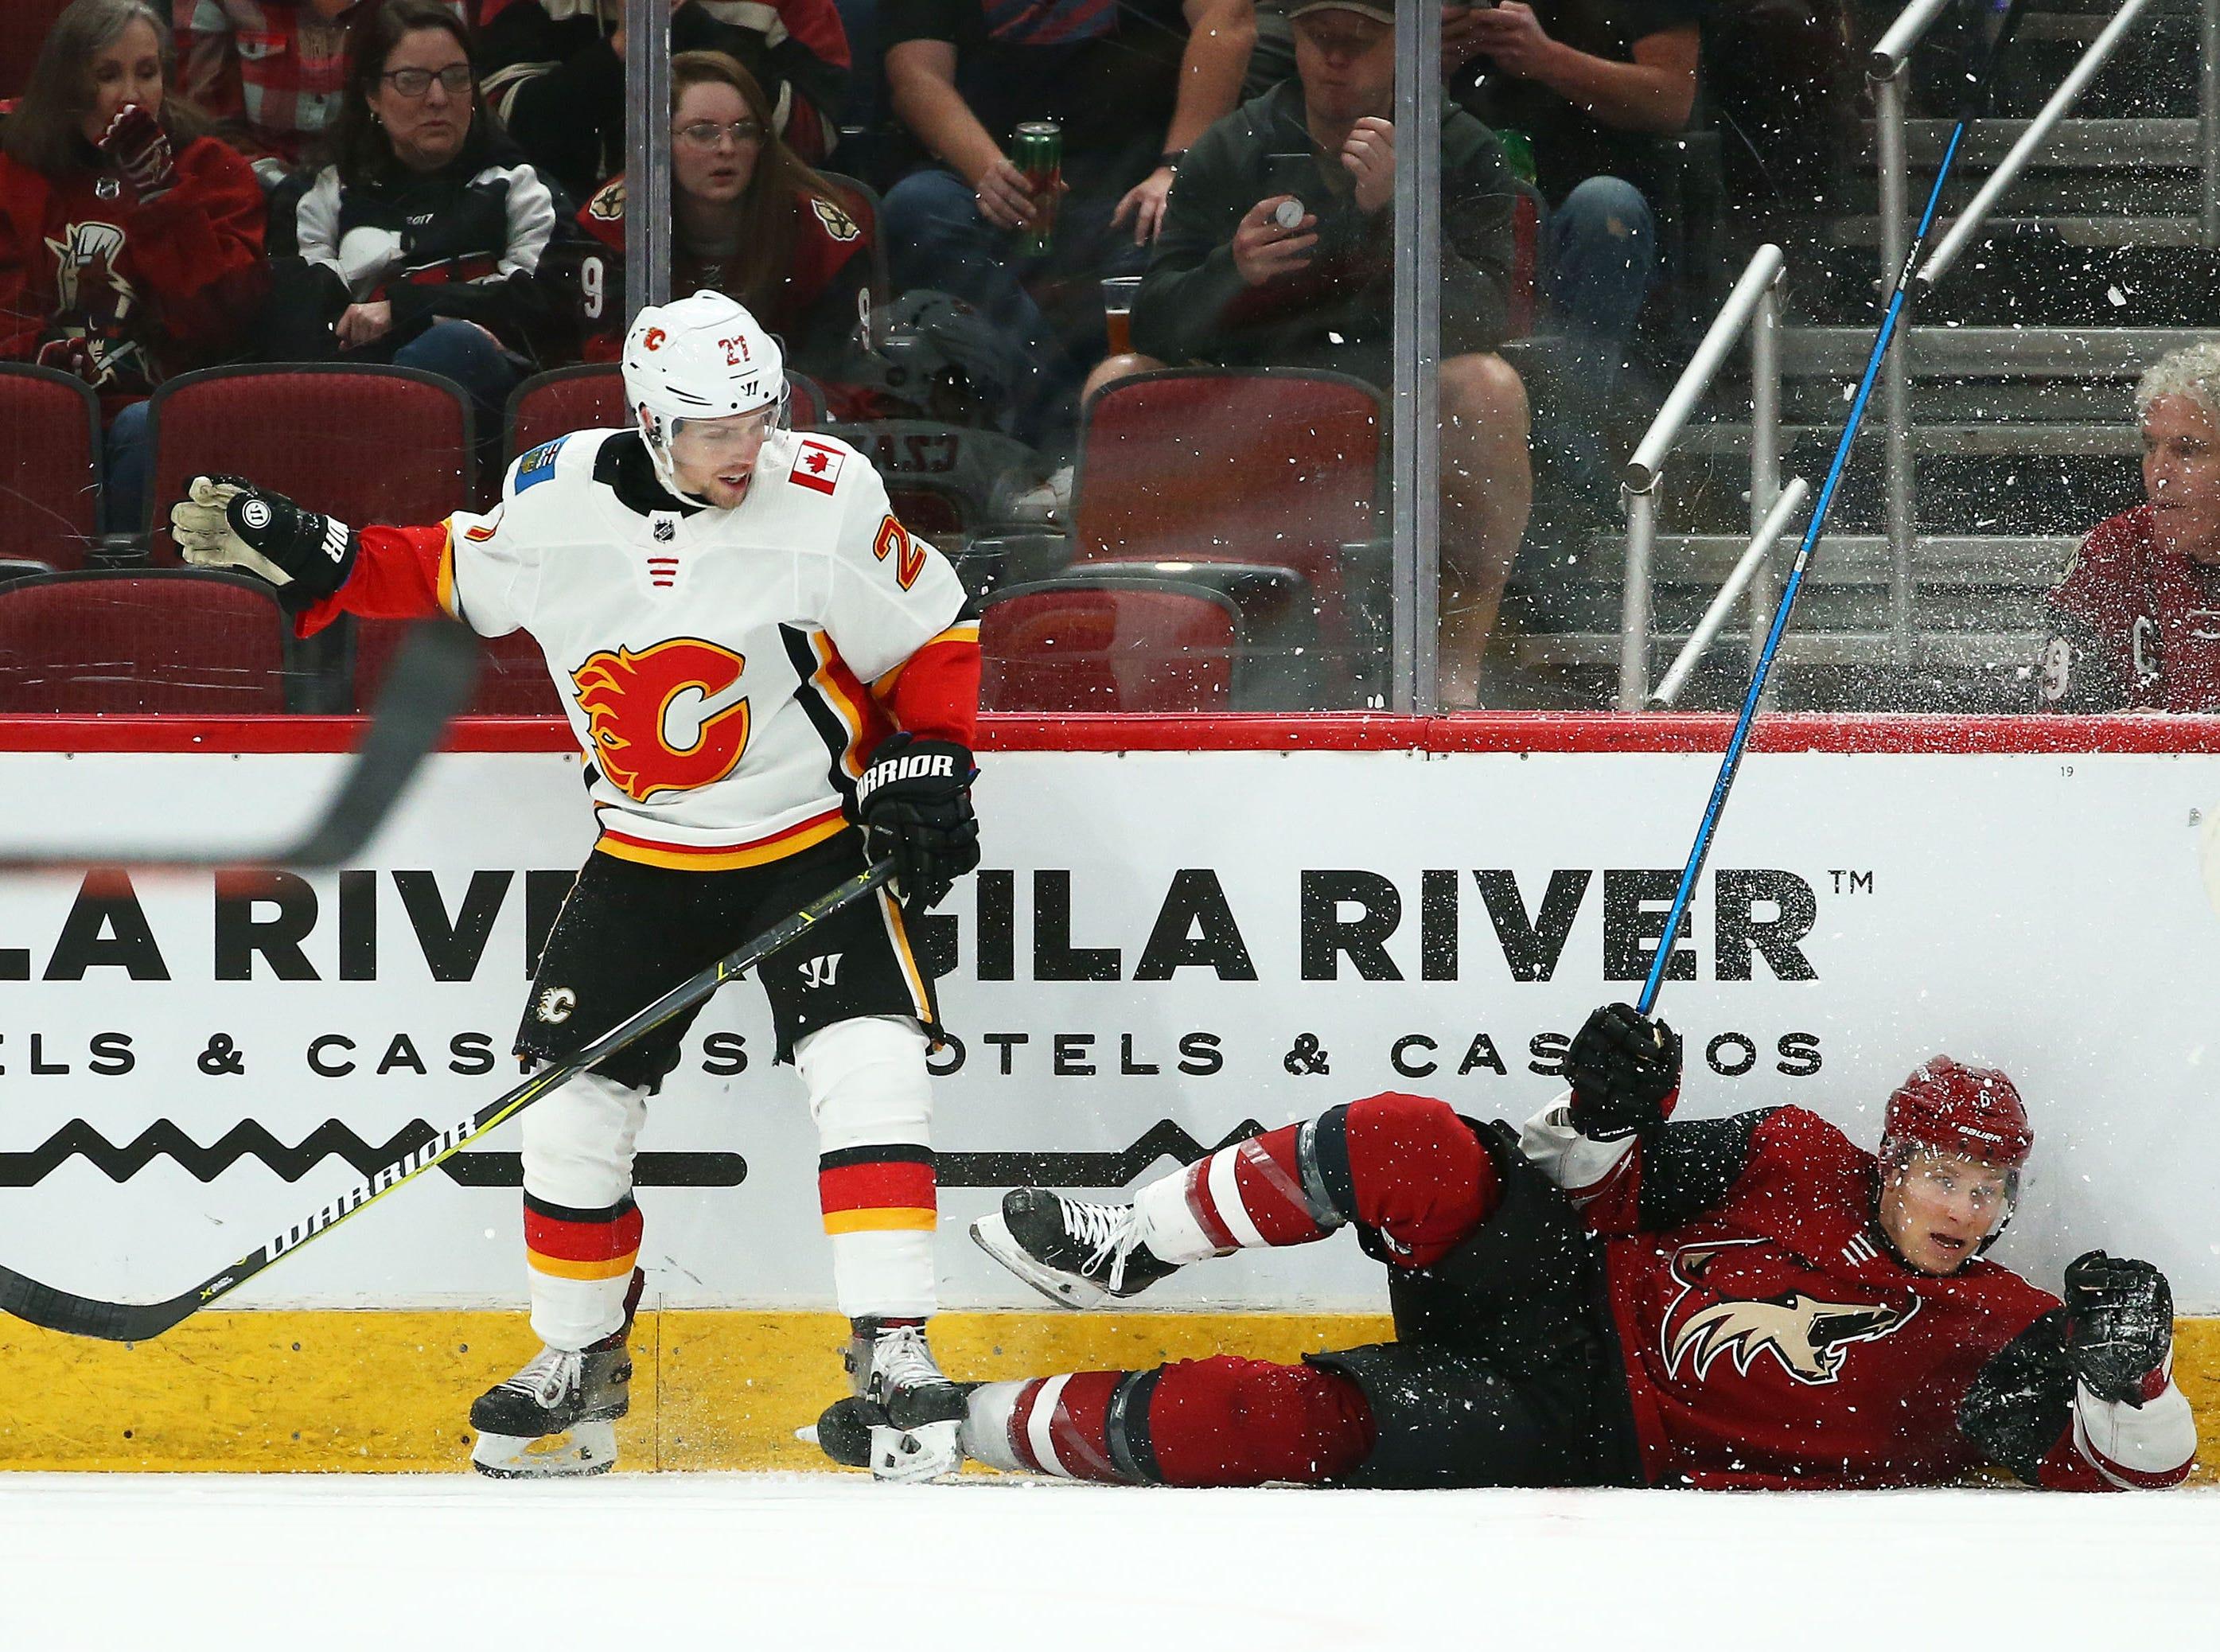 Calgary Flames center Austin Czarnik (27) checks Arizona Coyotes defenseman Jakob Chychrun (6) in the second period on Mar. 7, 2019, at Gila River Arena in Glendale, Ariz.